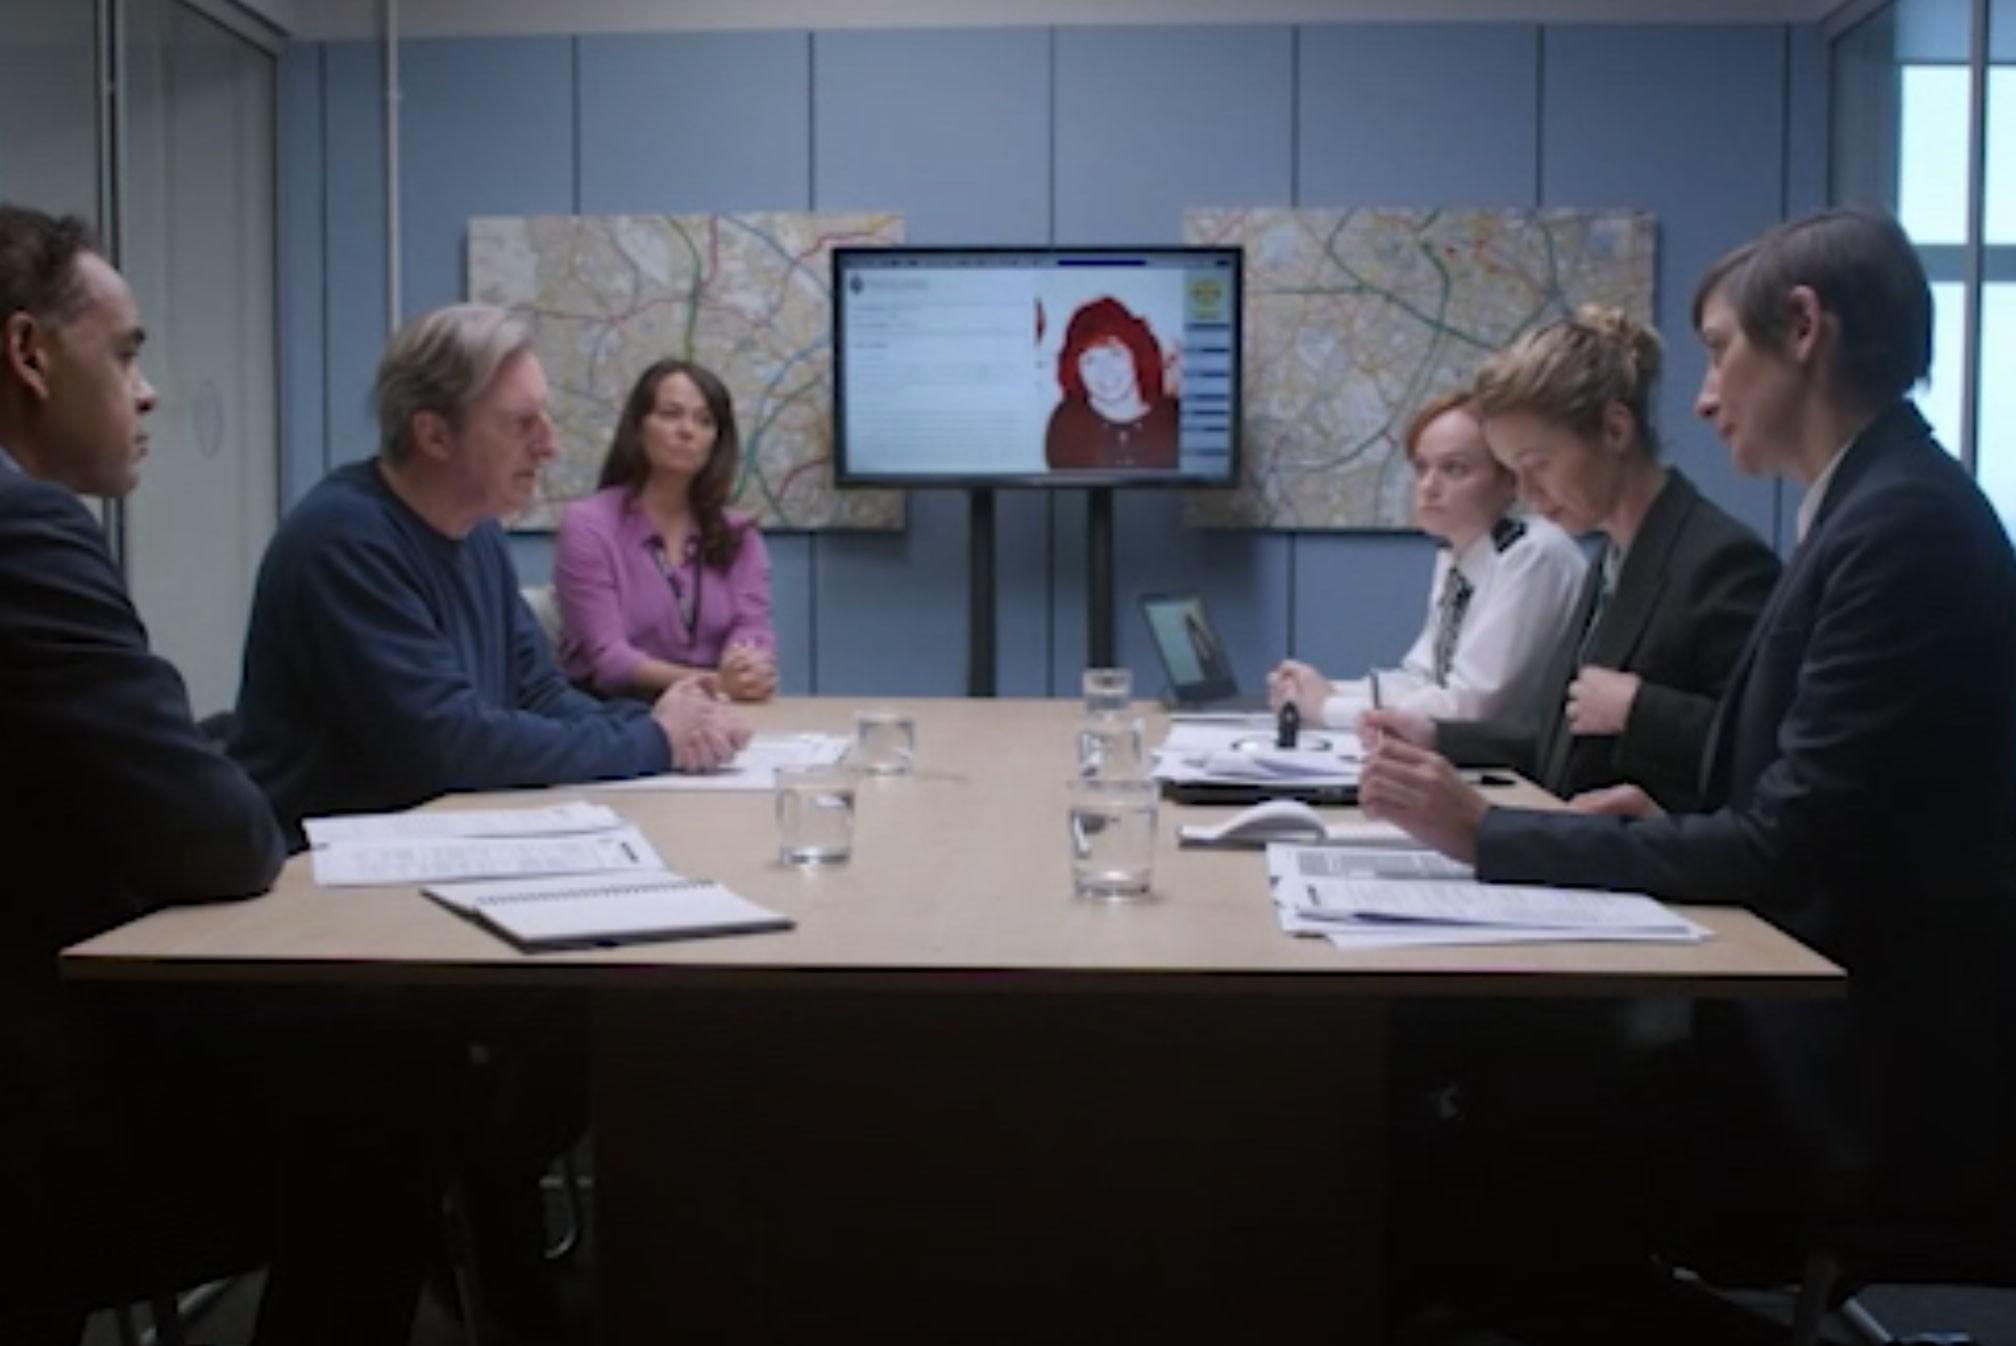 hasting-interview-scene